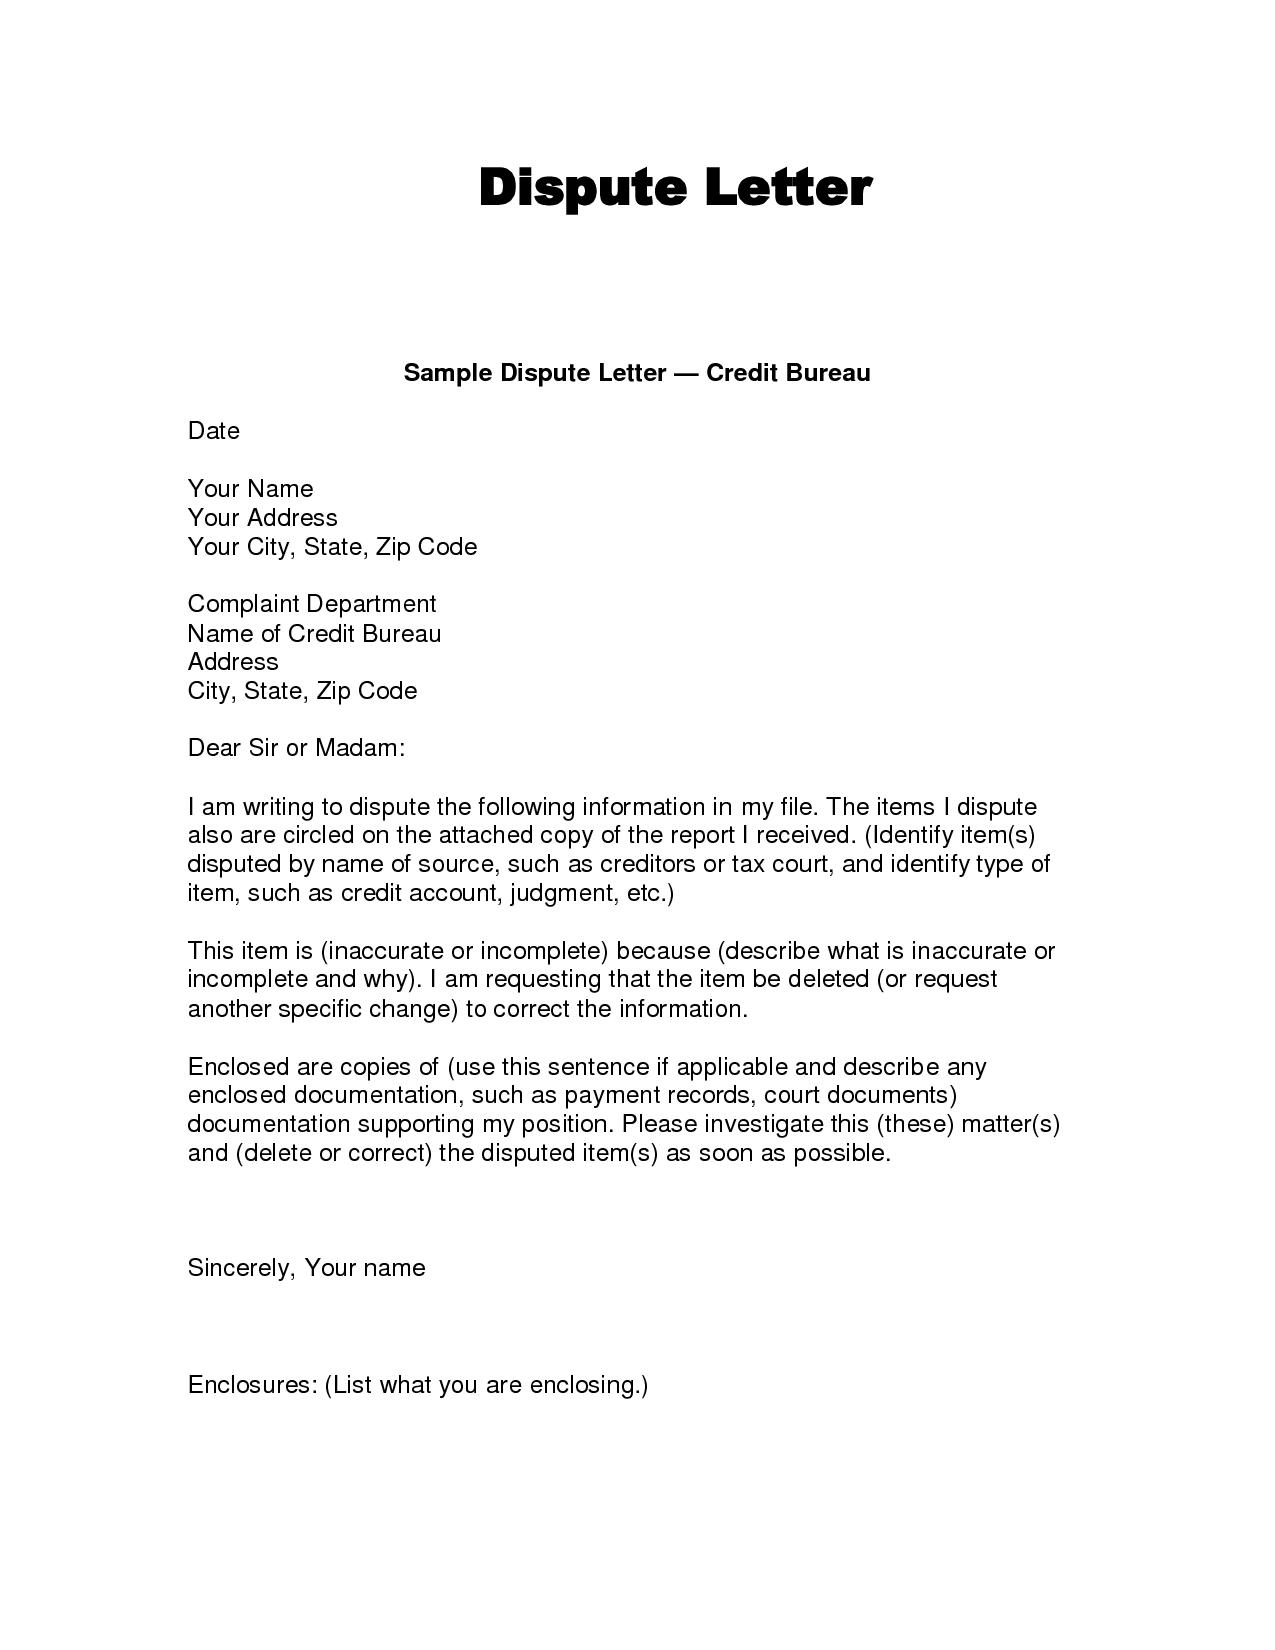 Credit Dispute Letter Templates Acurnamedia